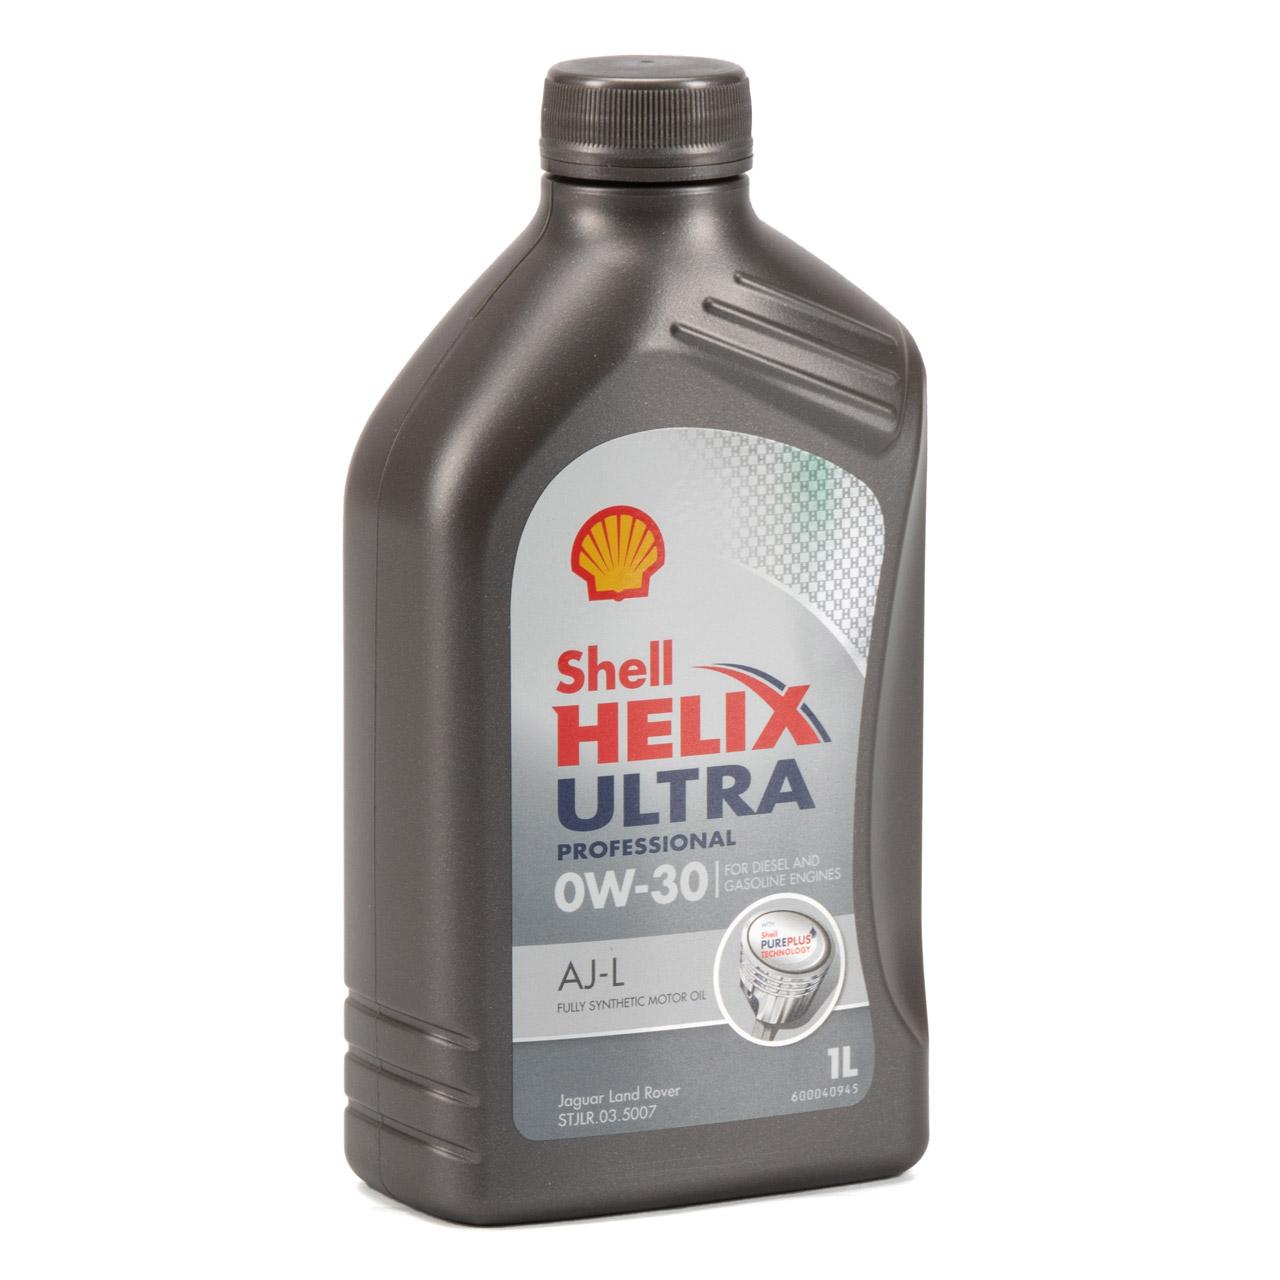 SHELL Motoröl Öl HELIX ULTRA AJ-L 0W30 API SN JAGUAR LAND ROVER - 1L 1 Liter